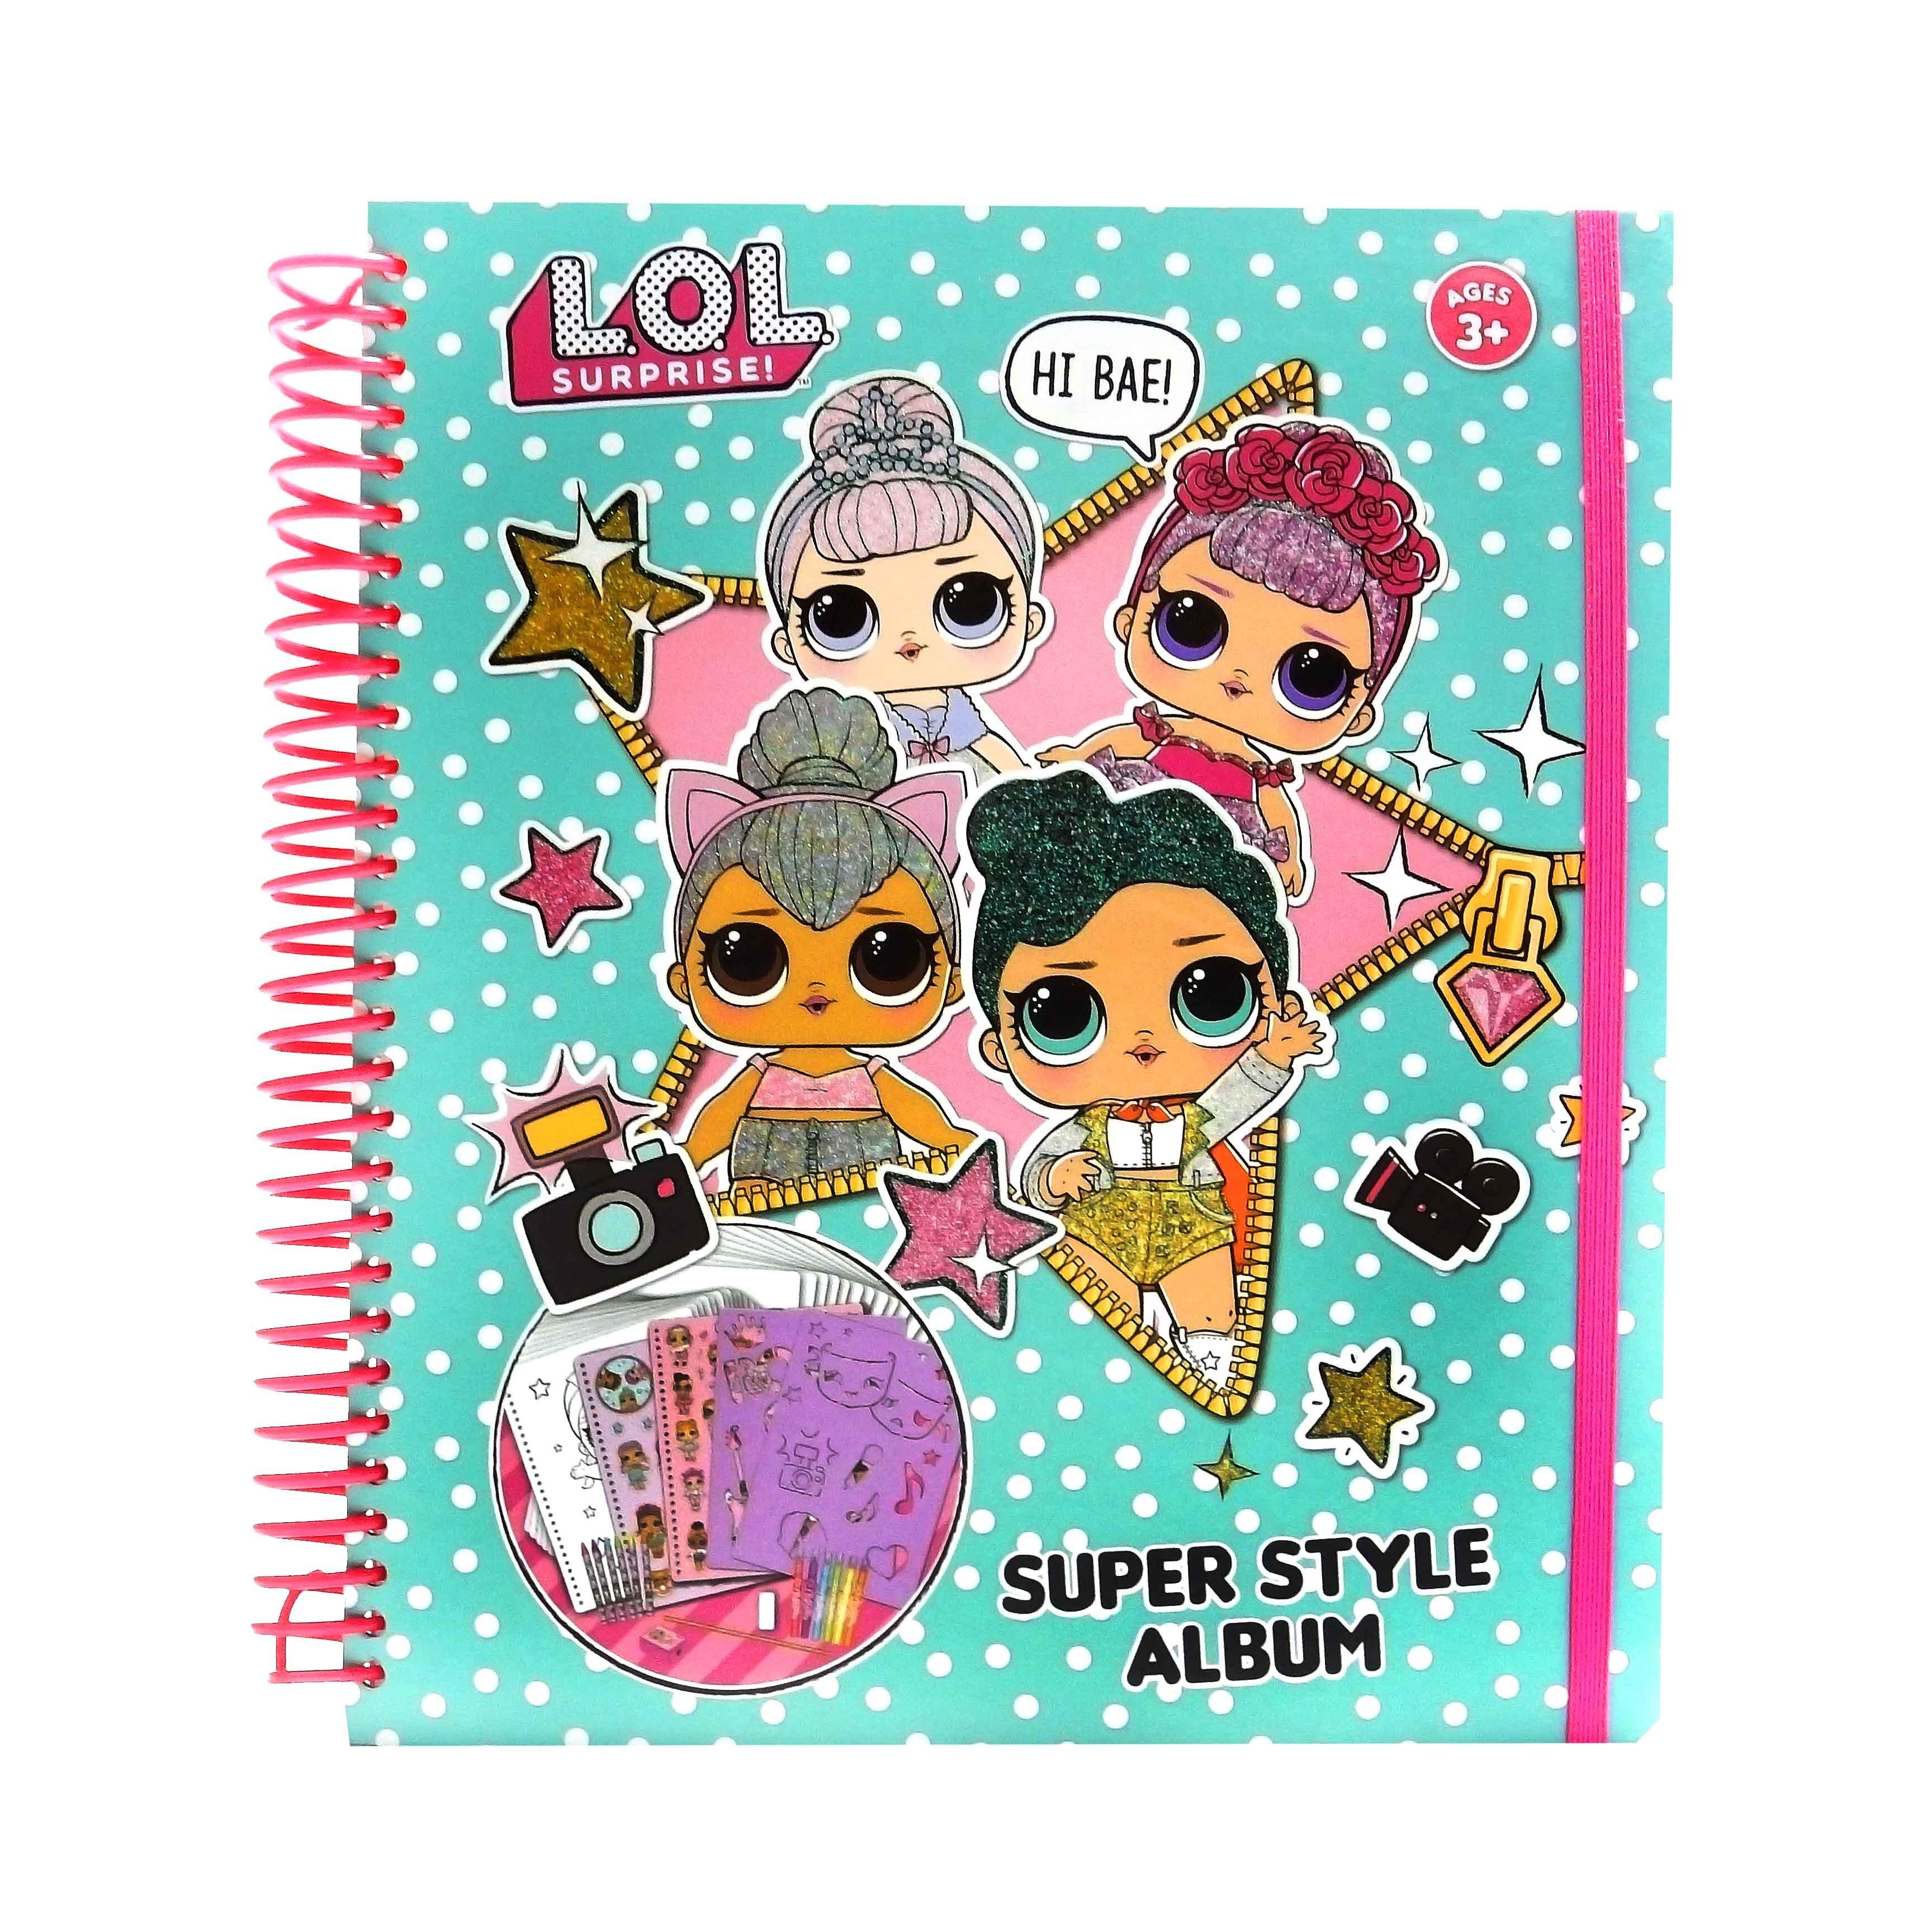 лол альбом Lol Surprise Super Style Album оригинал